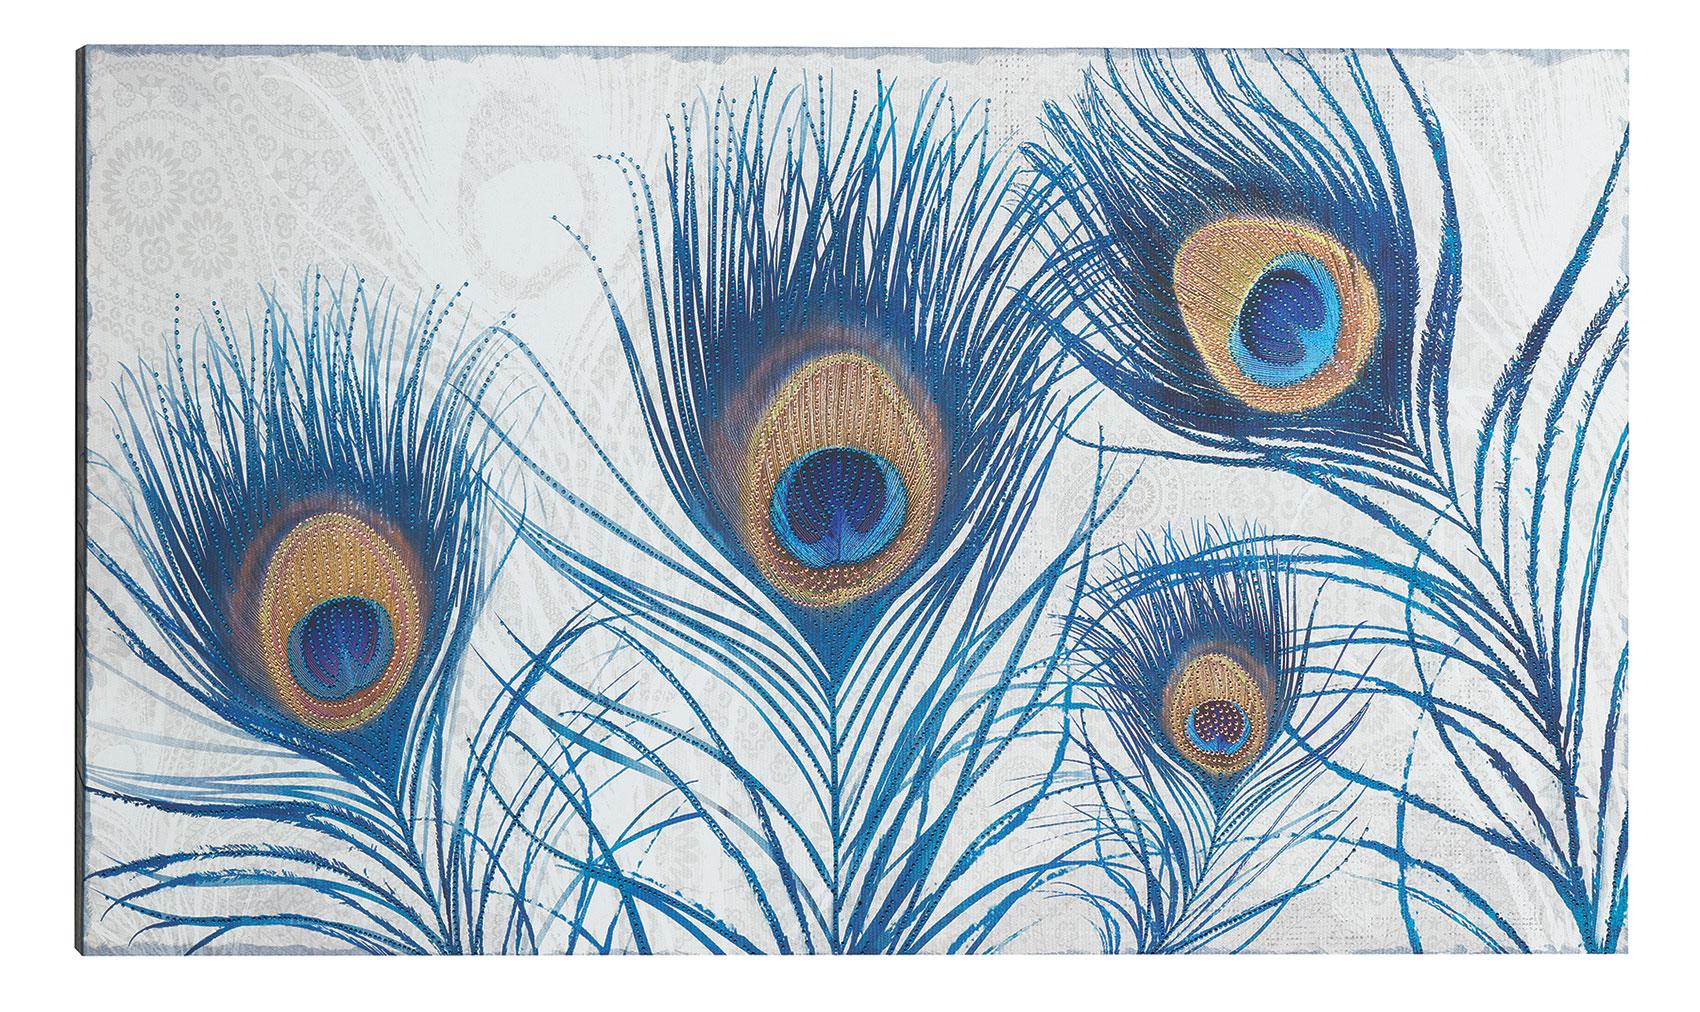 Coaster Wall Art Art - Item Number: 960847